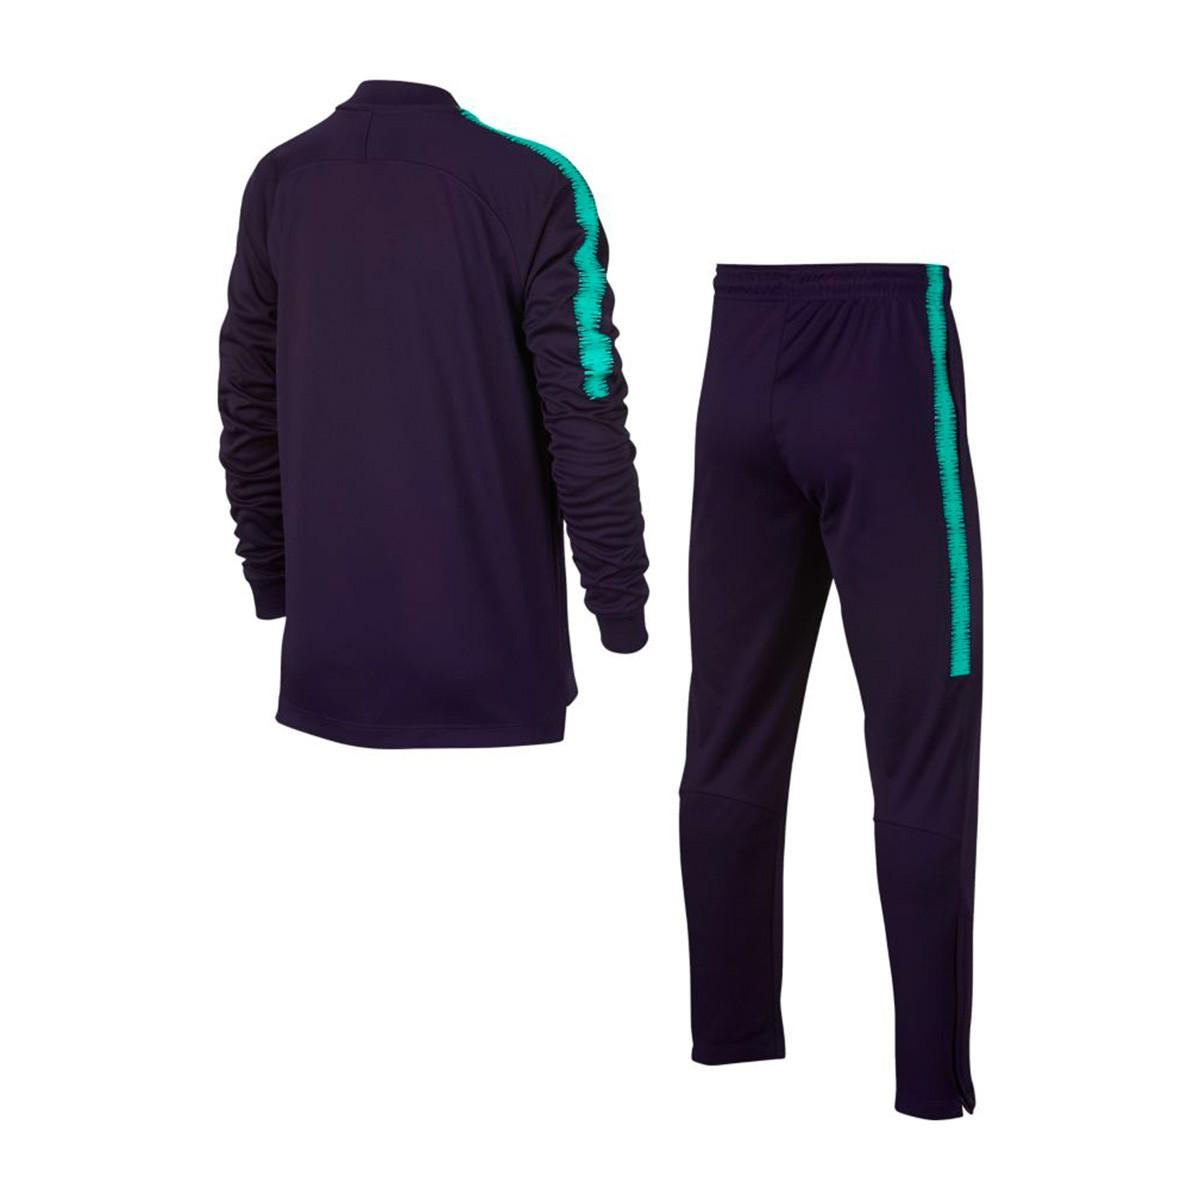 Chándal Nike Dry FC Barcelona Squad 2018-2019 Niño Purple dynasty-Hyper  turquoise - Soloporteros es ahora Fútbol Emotion 50ebb28de79e3